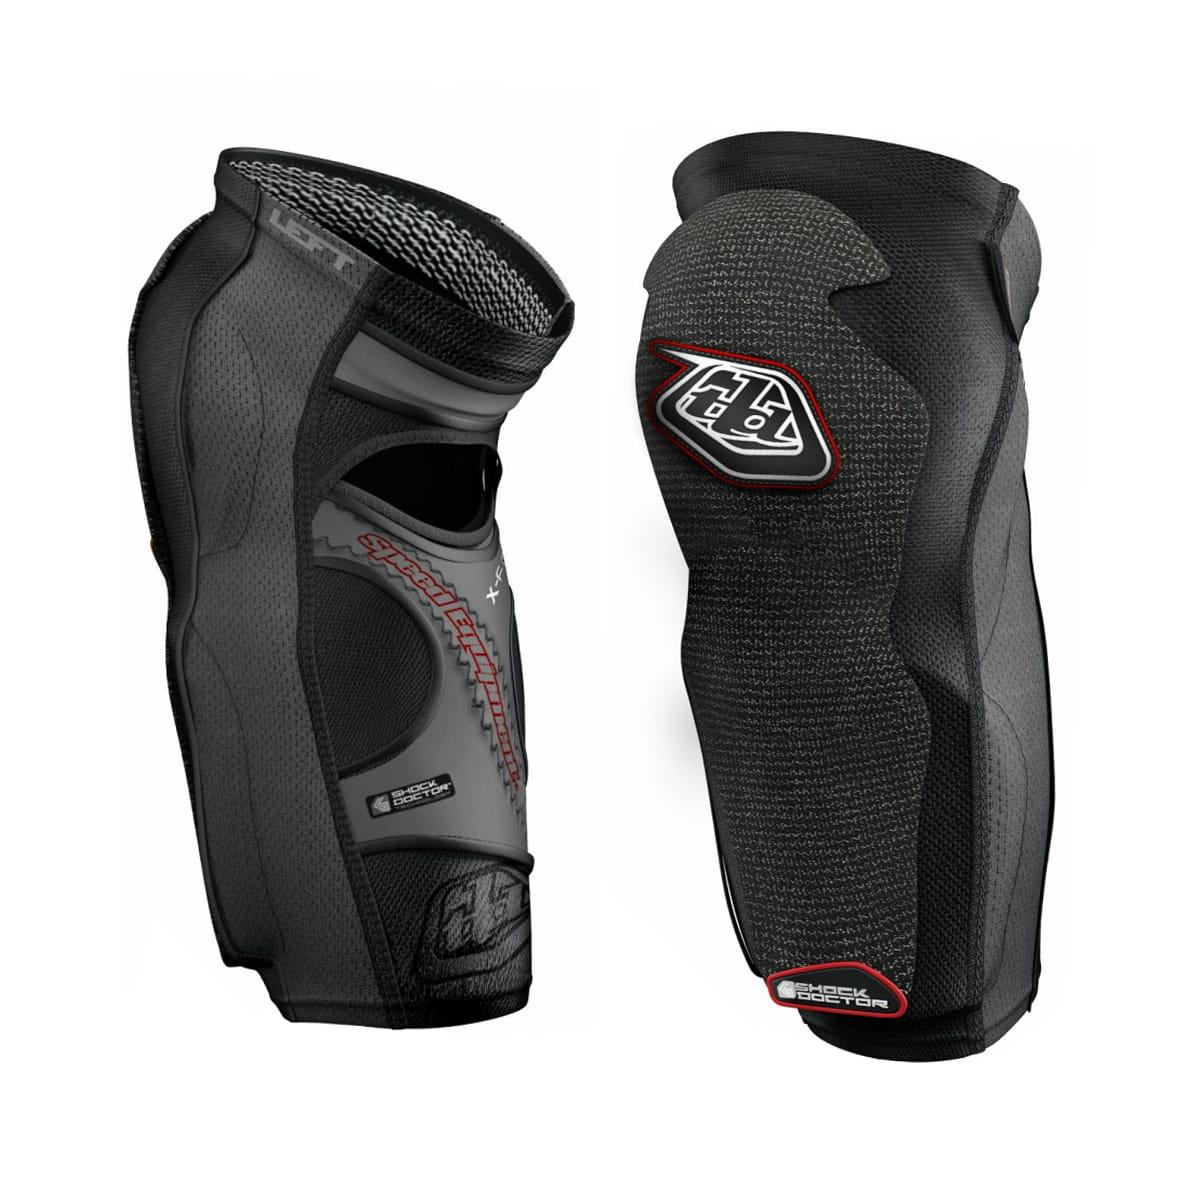 Troylee Designs Schutzkleidung Kgl 5450 Knee Shin Guard